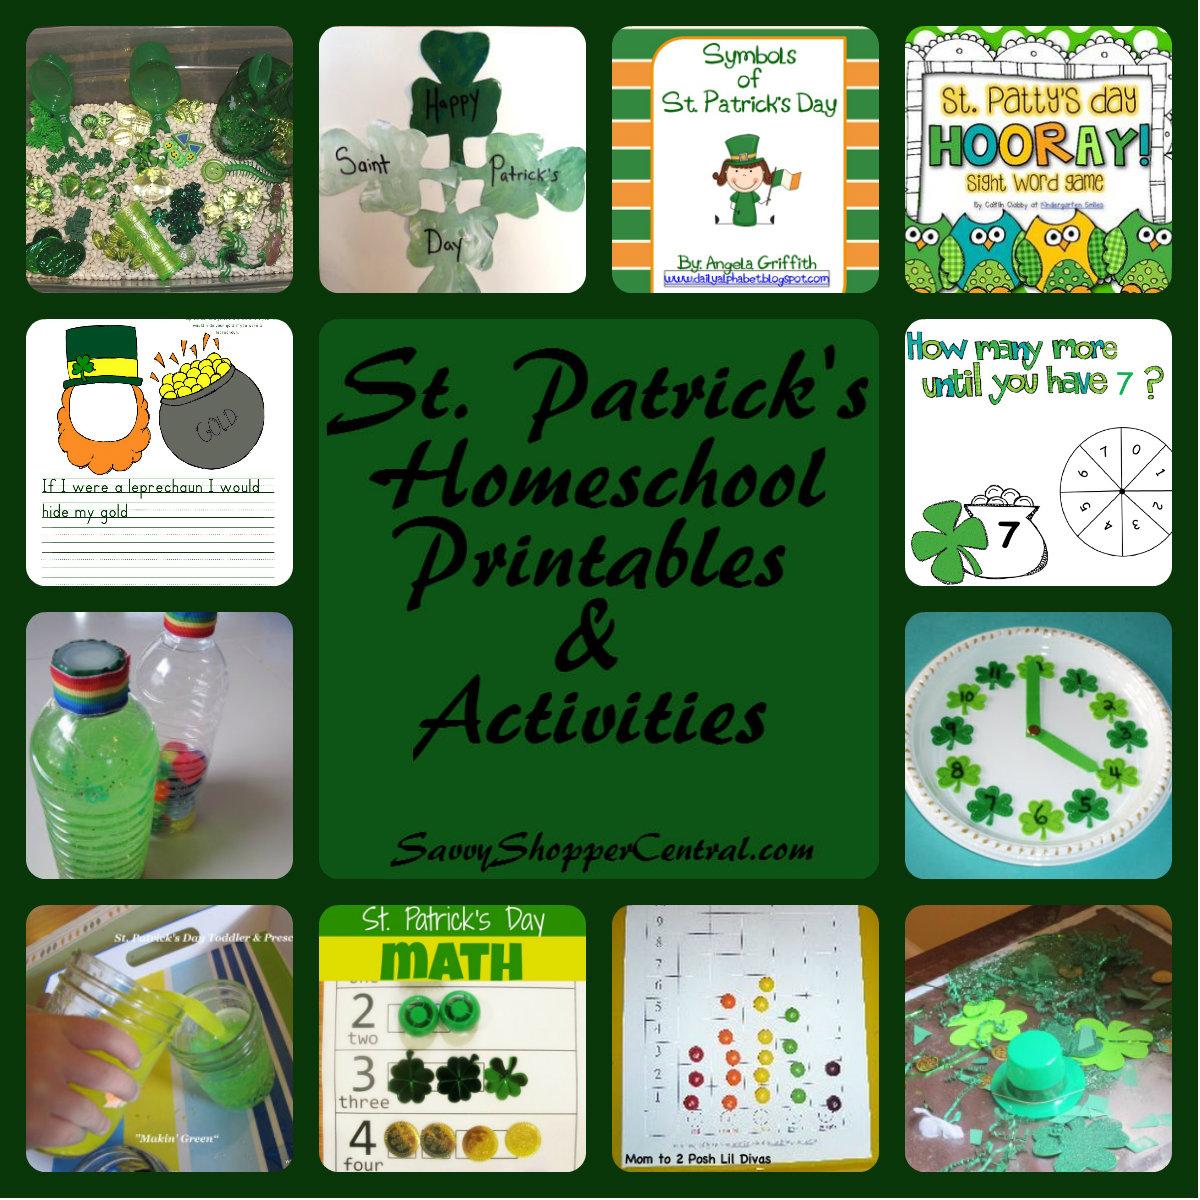 St Patrick's Day Homeschool Printables & Activities